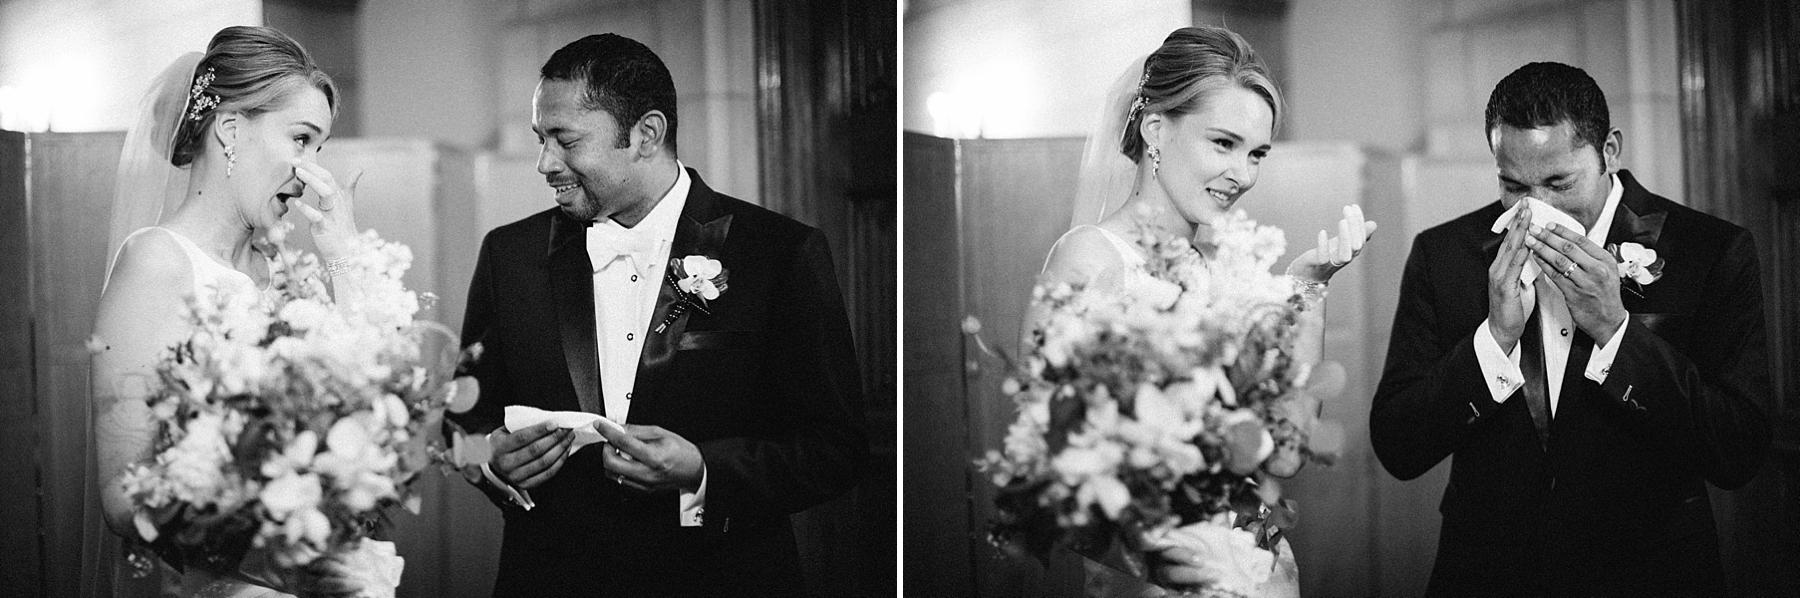 top-chicago-cafe-brauer-wedding-photographer-_0038.jpg